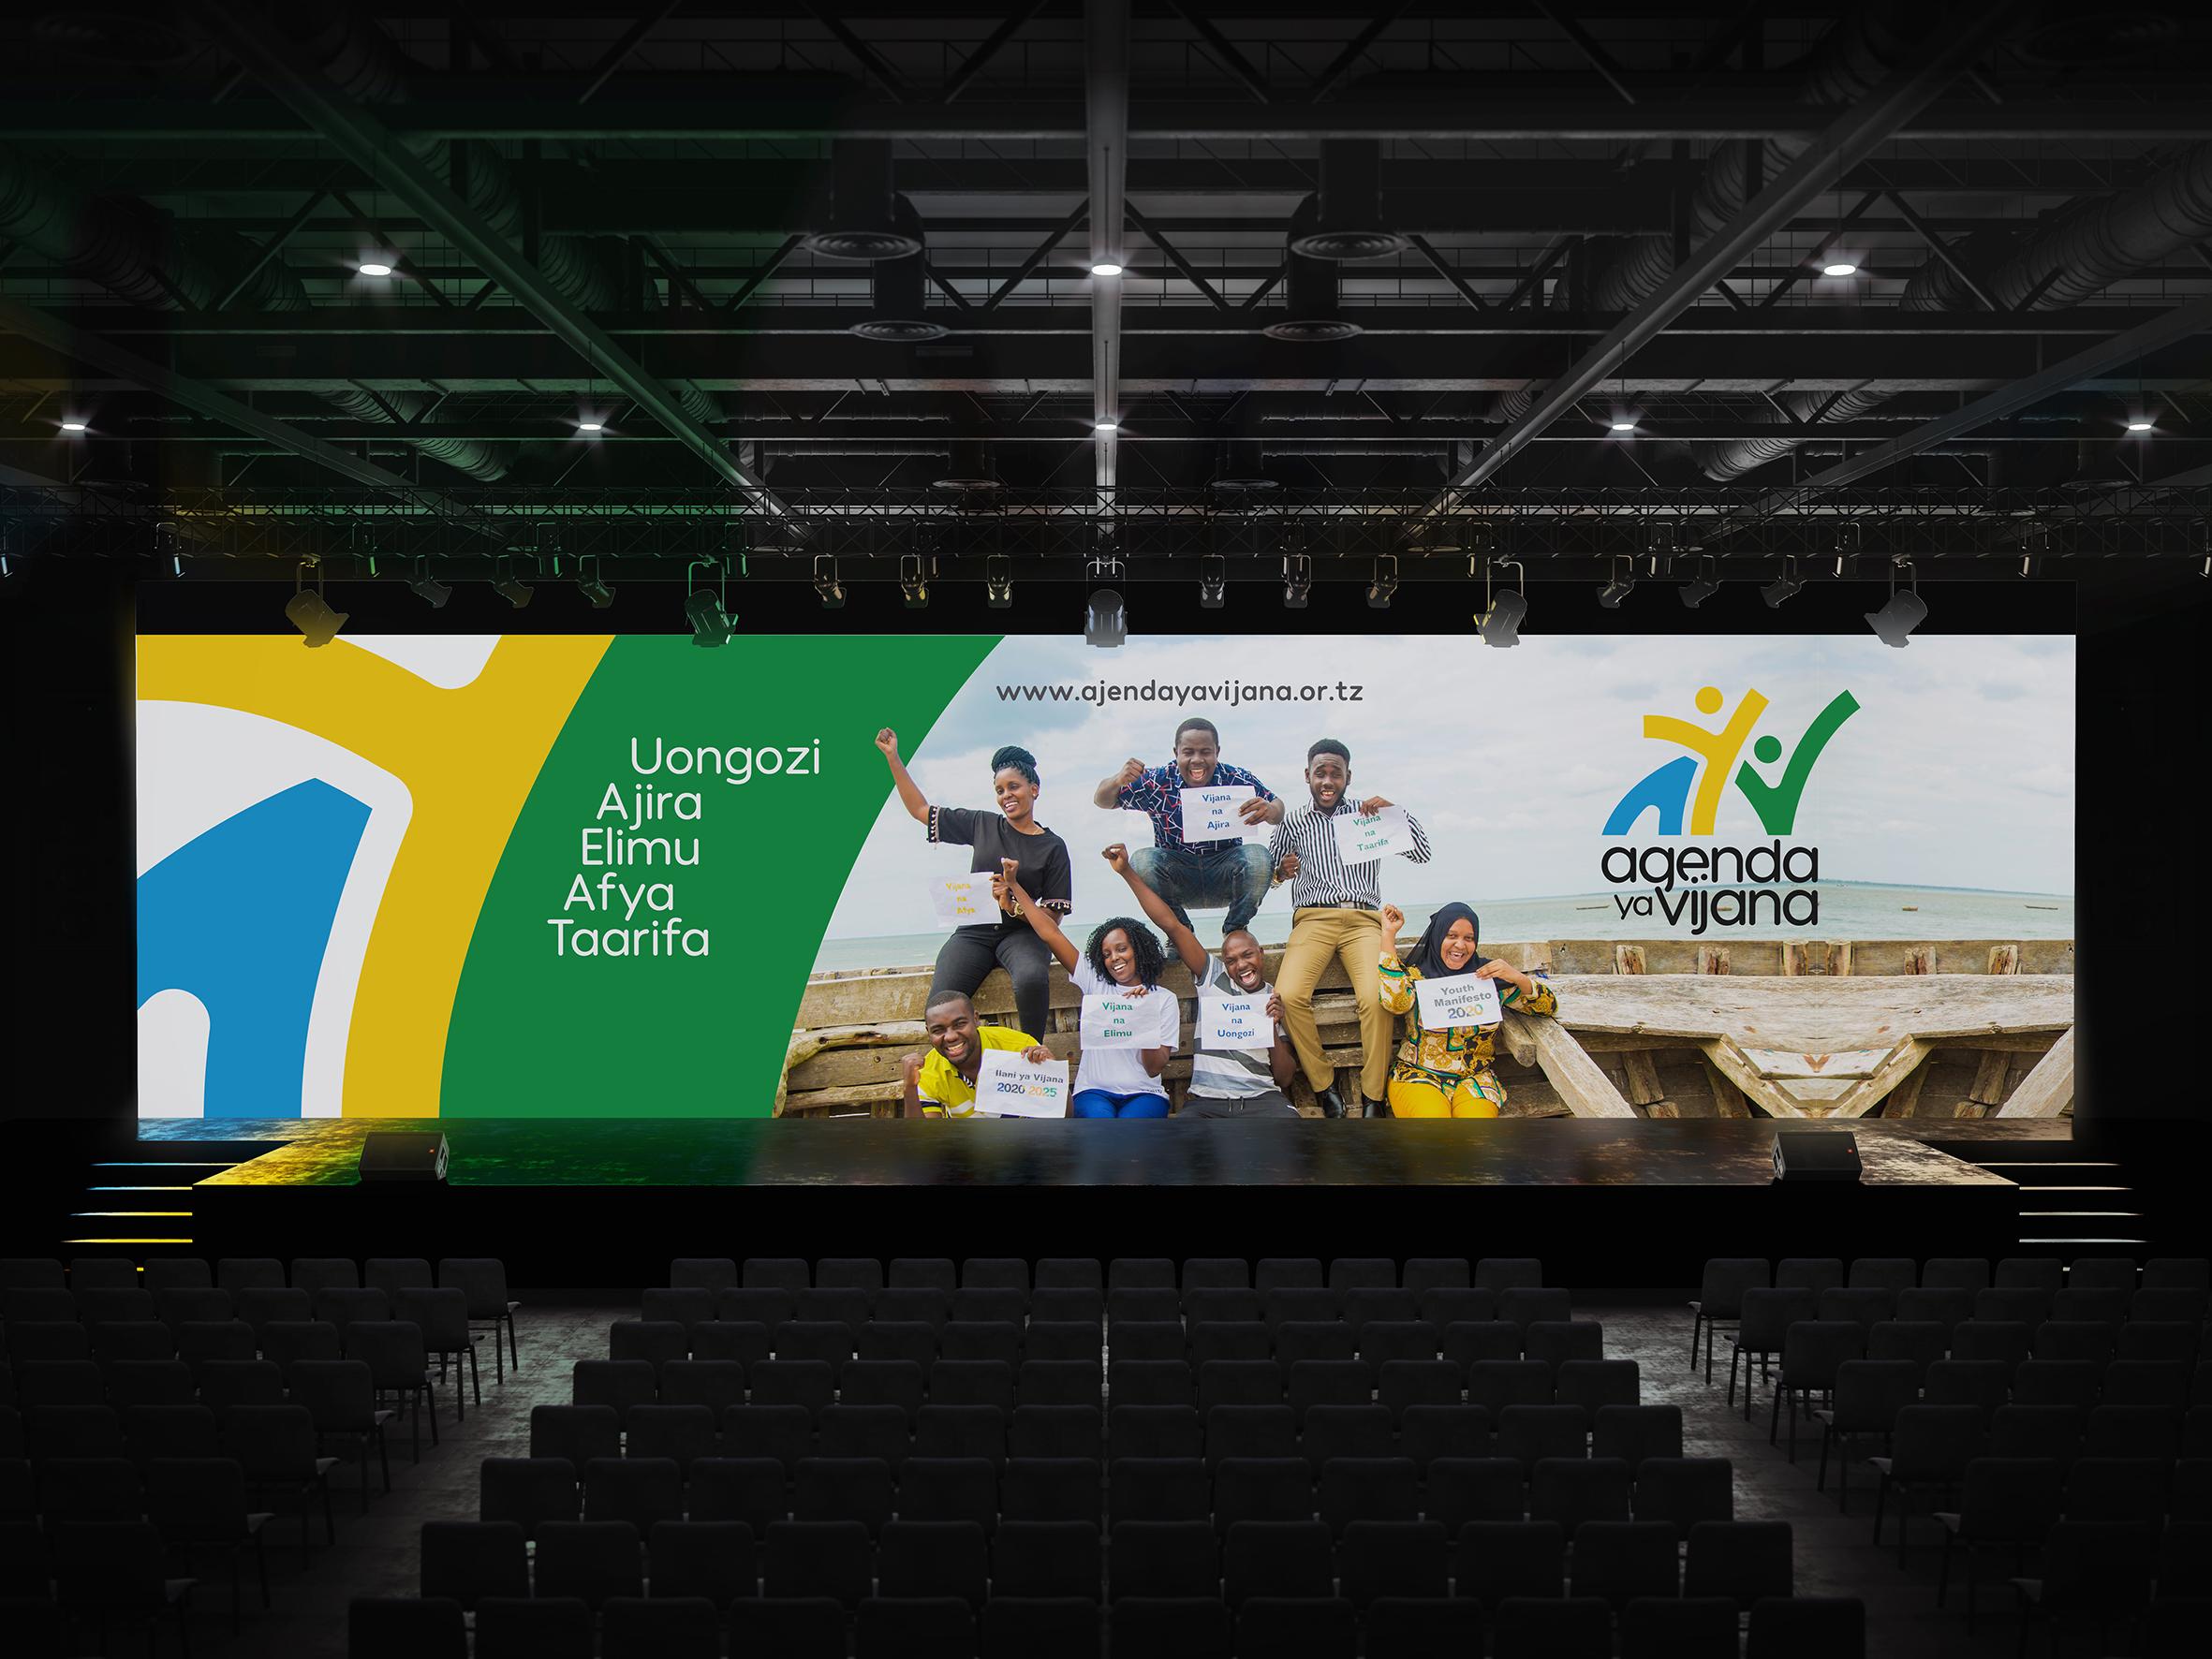 """The Youth Manifesto"" Agenda Ya Vijana Campaign Branding by XAAF Brand"